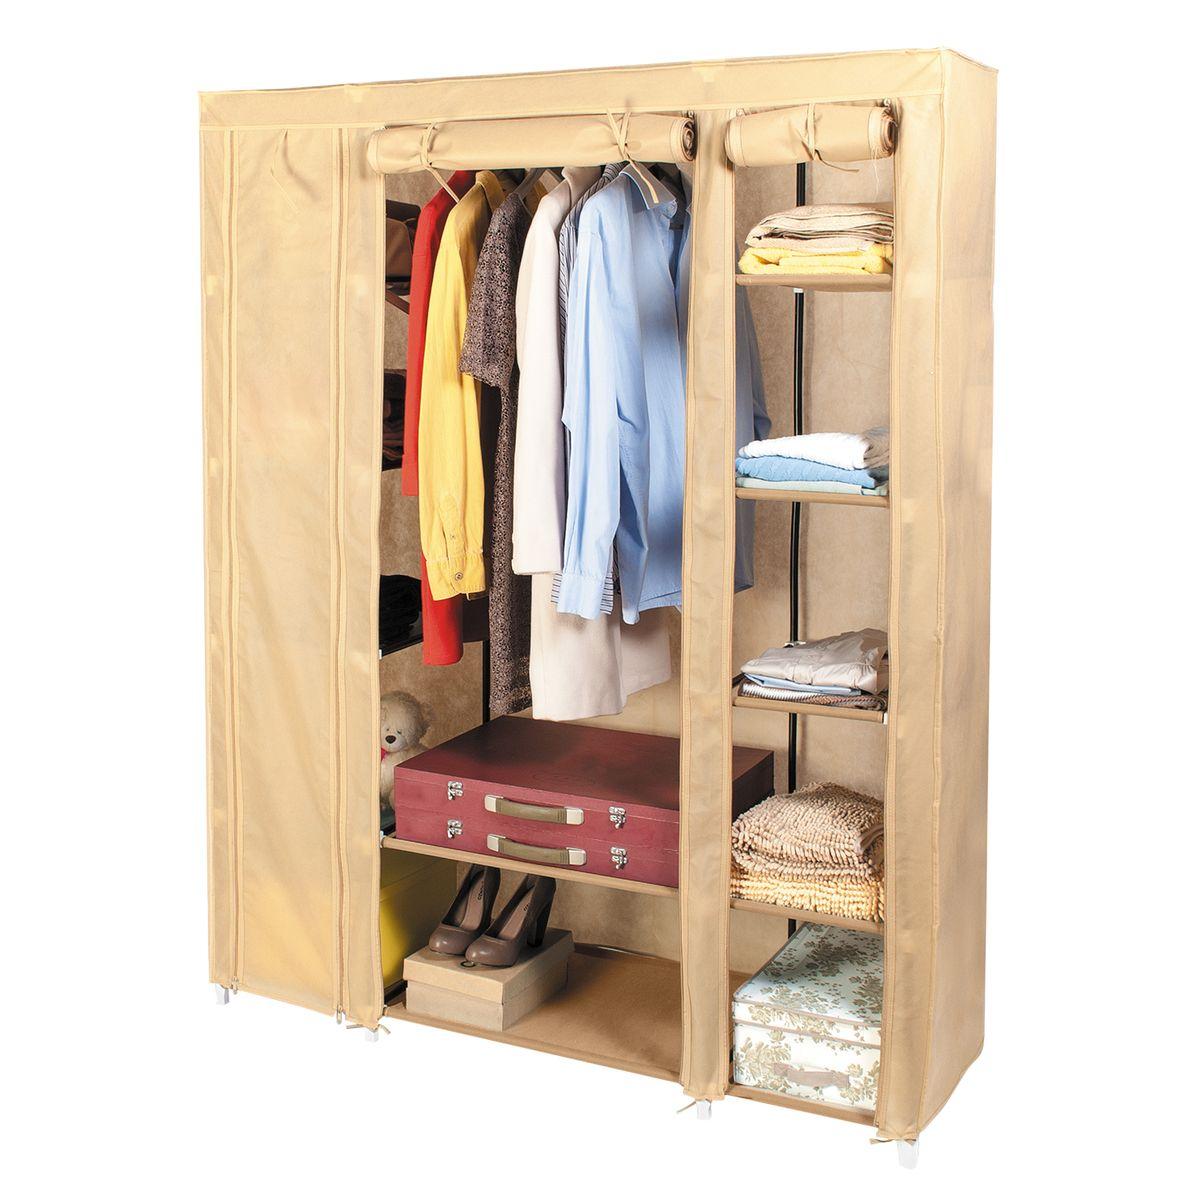 Шкаф для одежды artmoon montreal, цвет: бежевый, 135 см х 45.